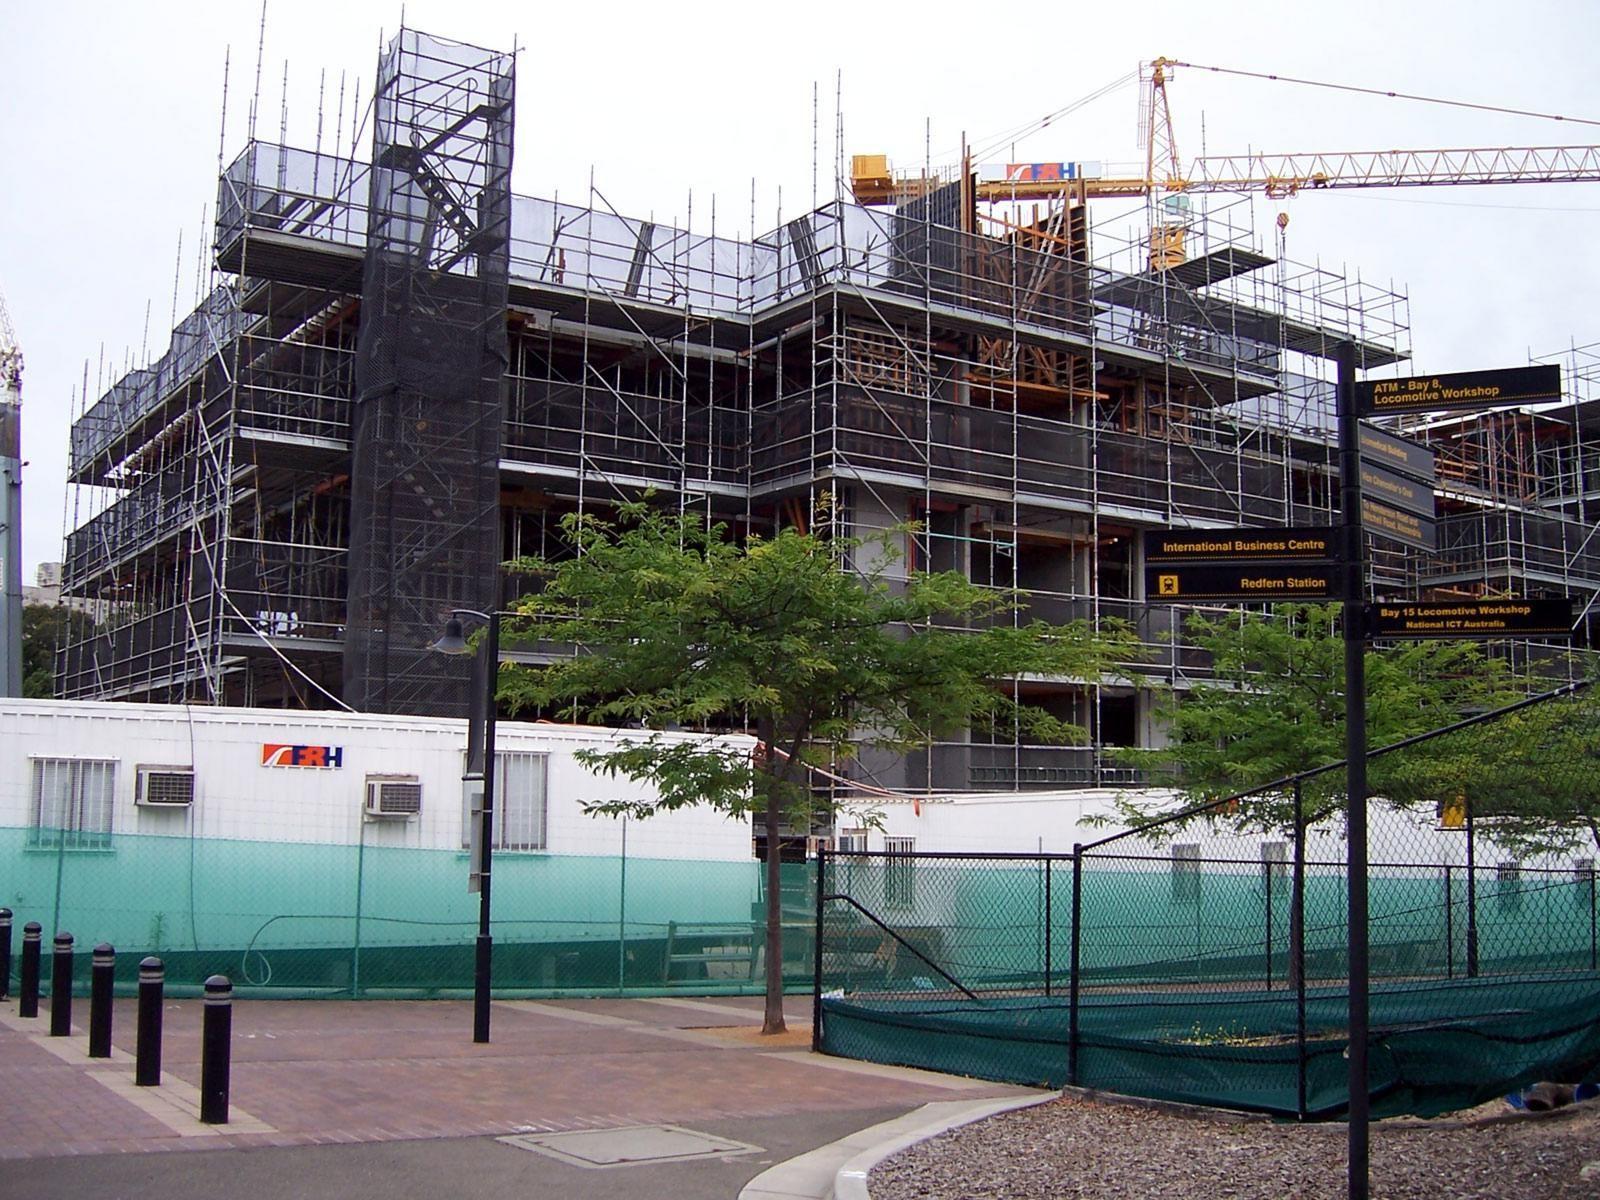 Australia's construction activity continues to decline